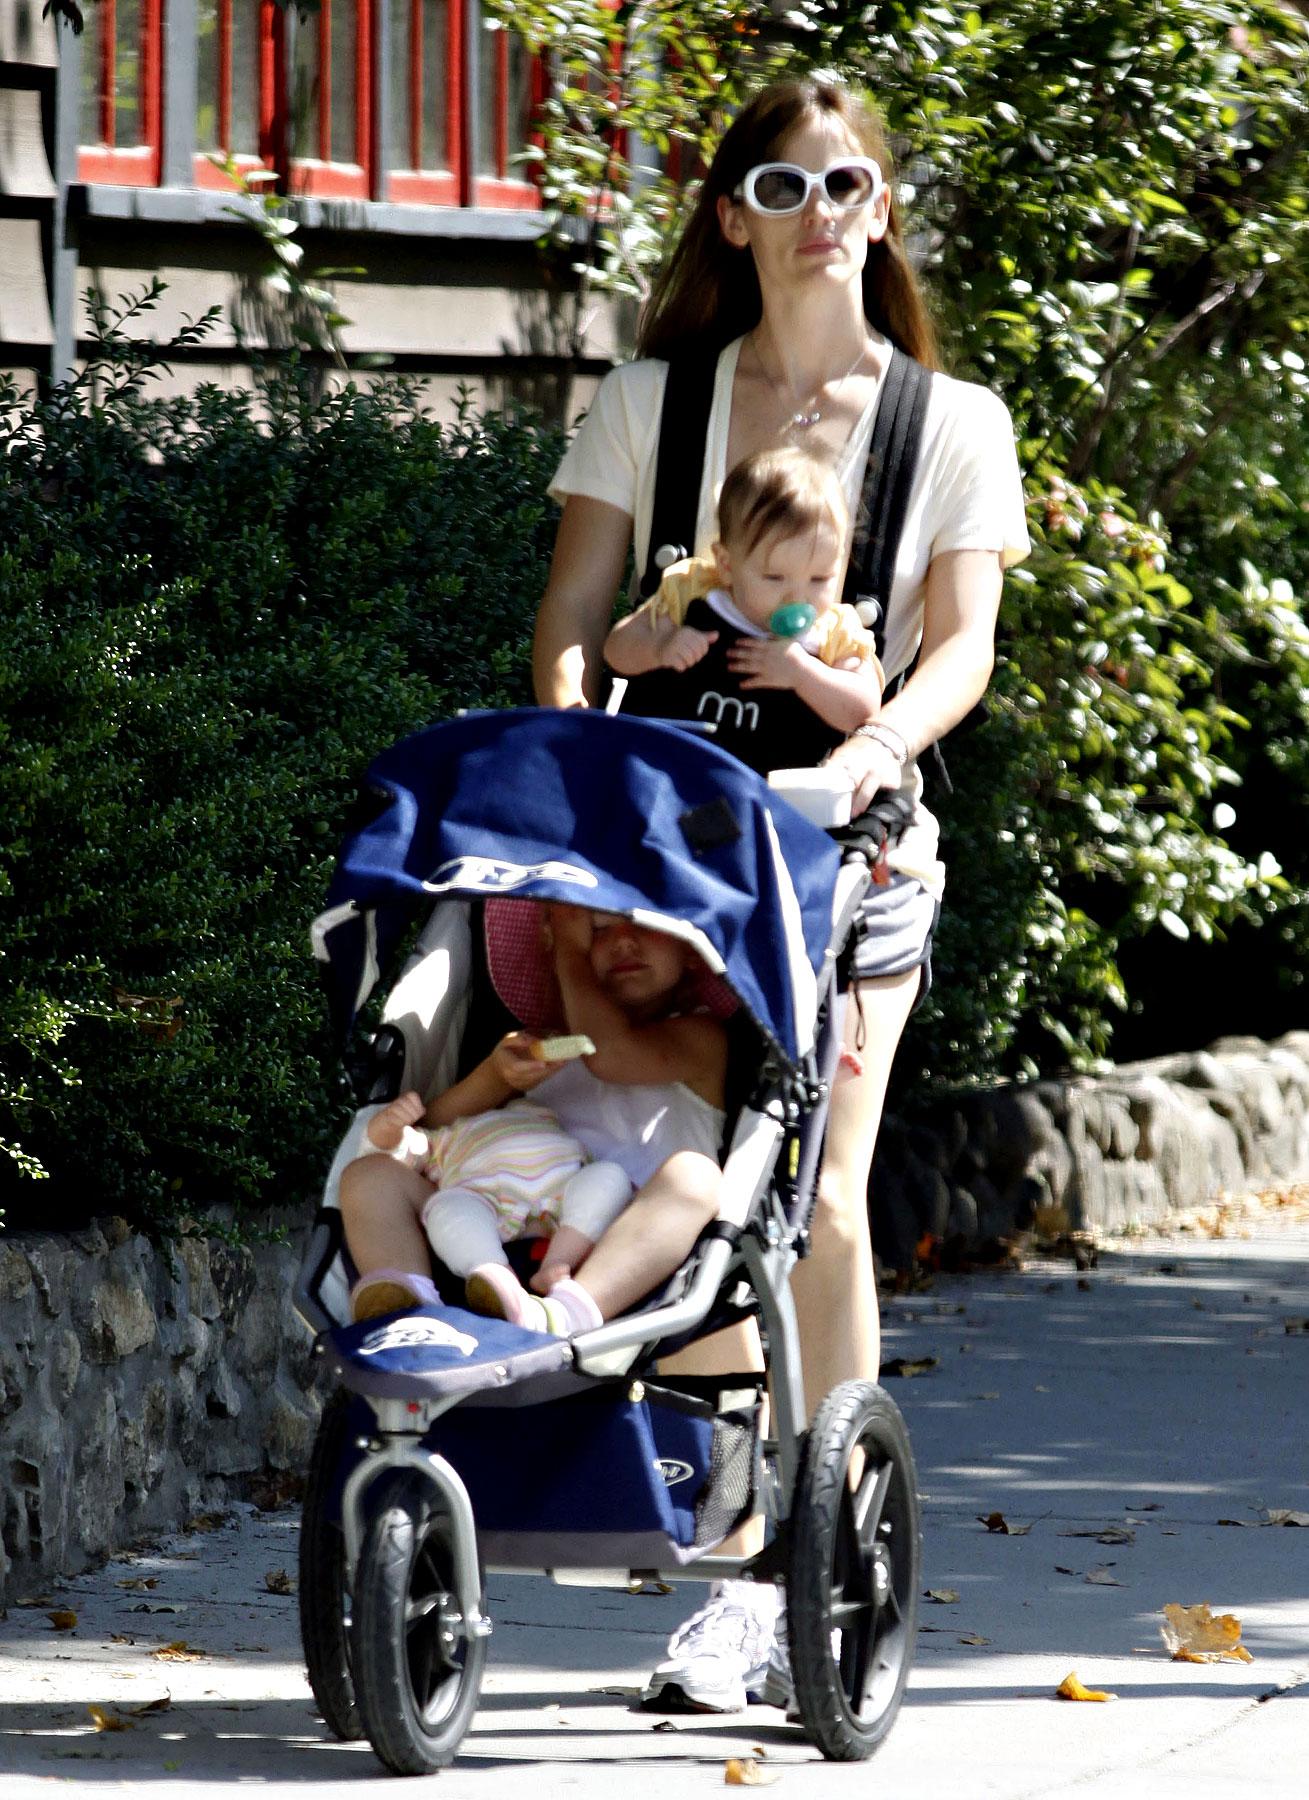 PHOTO GALLERY: Jennifer Garner & Her Girls in Boston